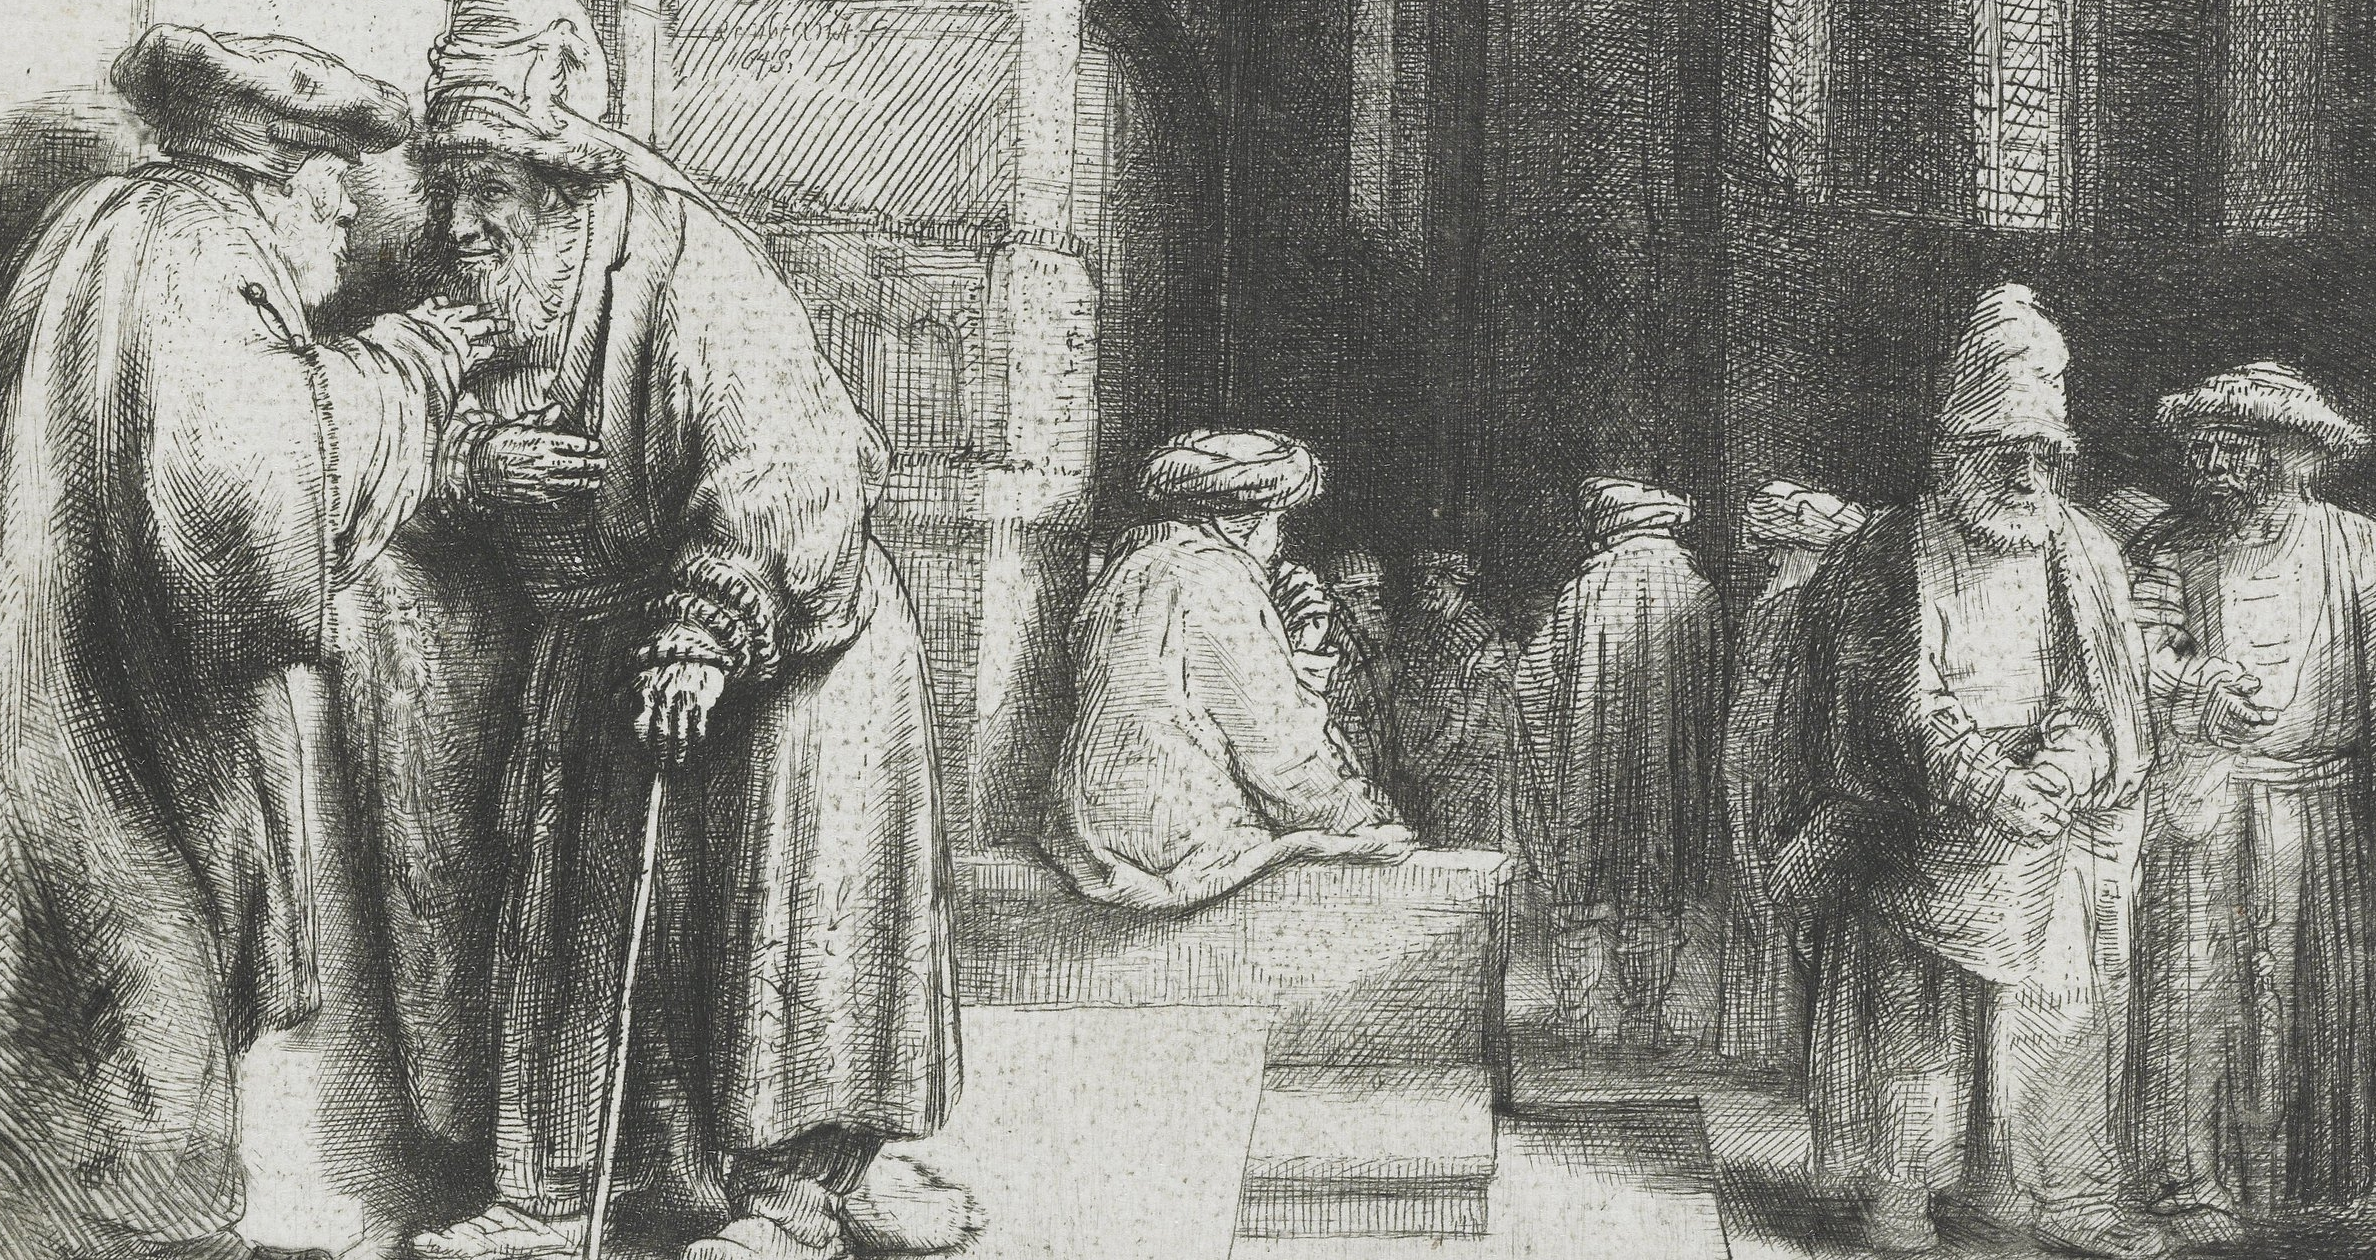 'Pharisees in the Temple' by Rembrandt Van Rijn